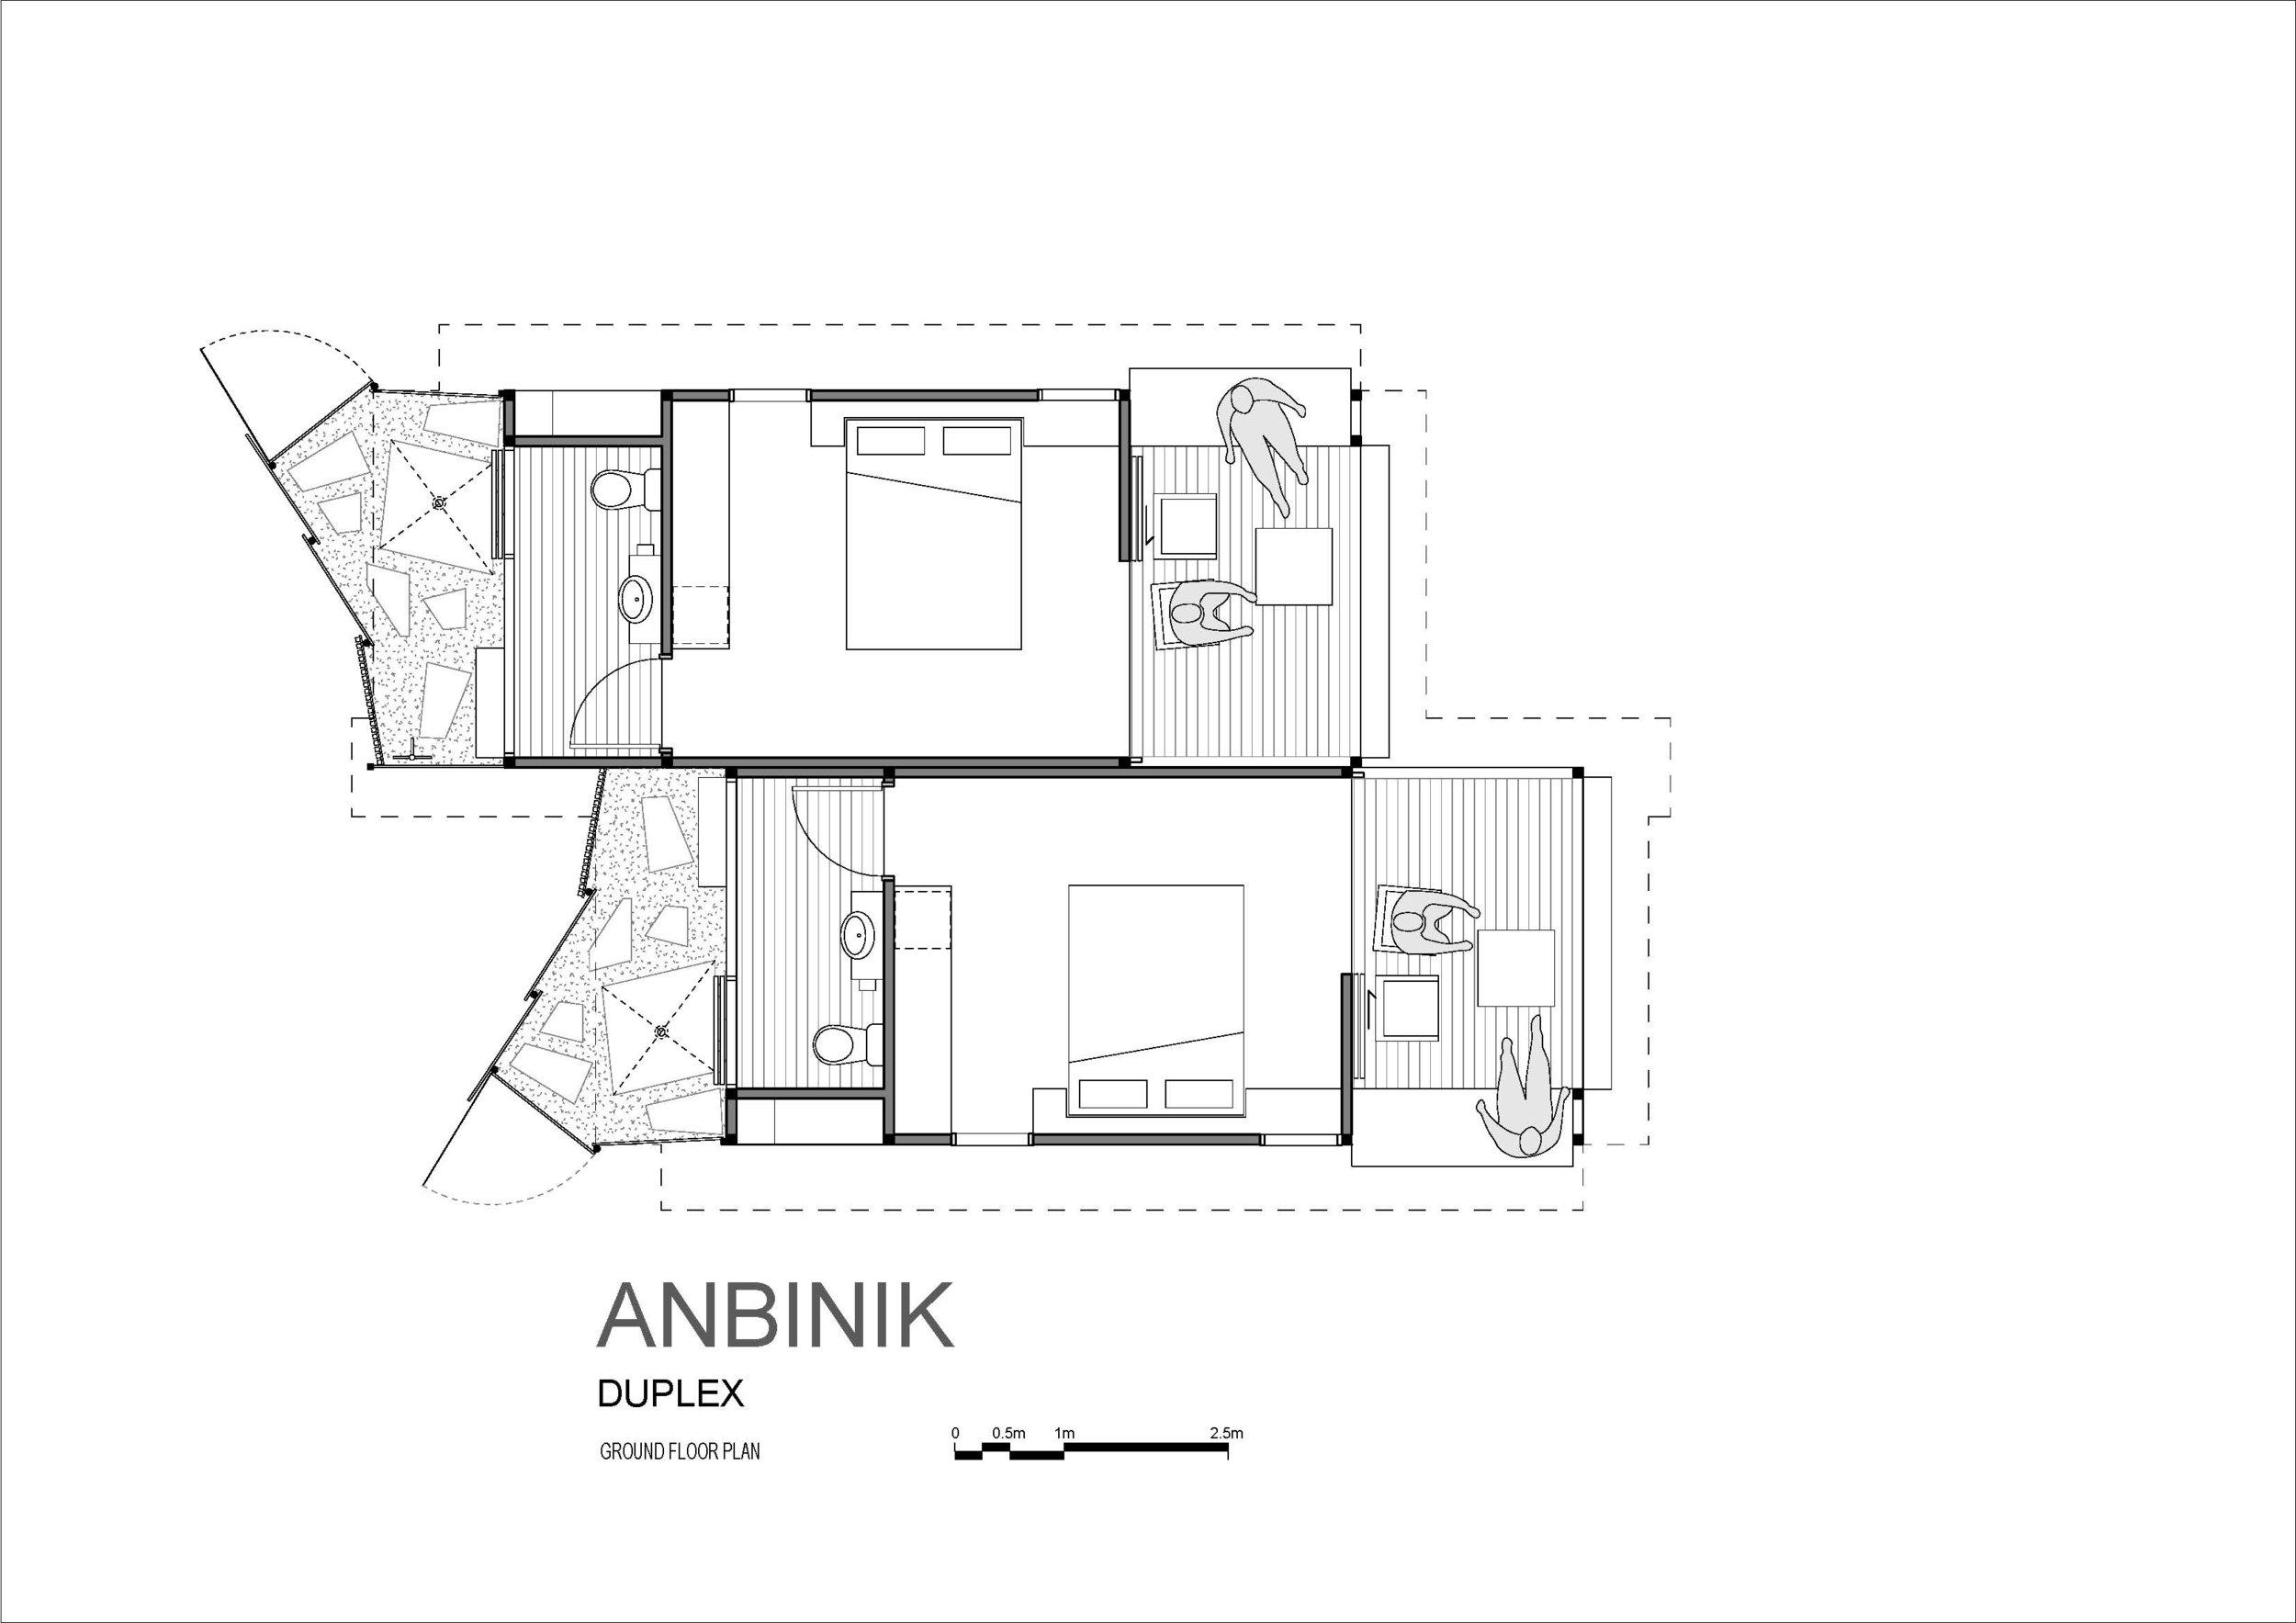 ANBINIK BUNGALOW_Duplex.jpg